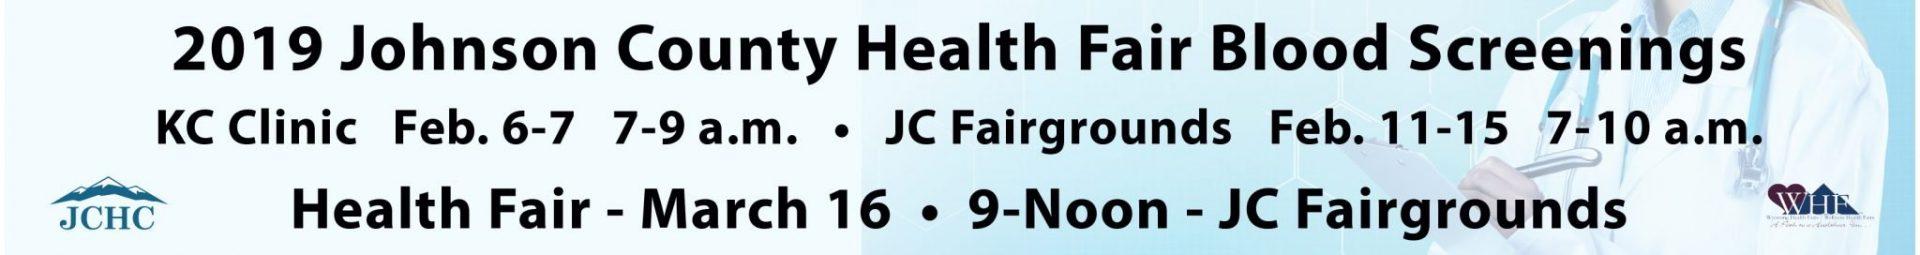 Health Fairs in Johnson County